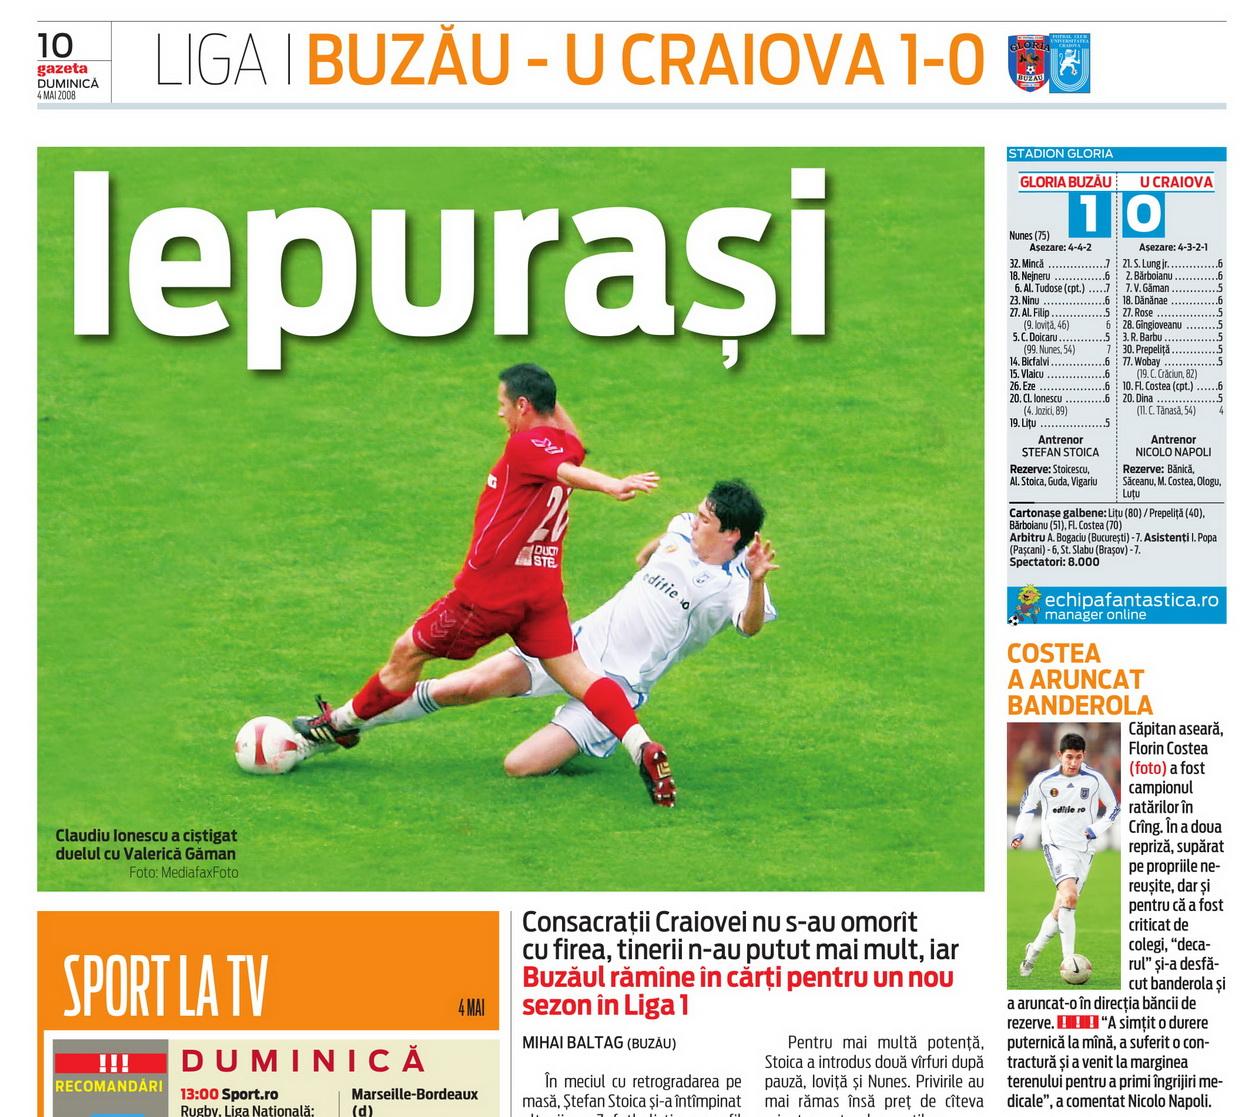 13 gazeta